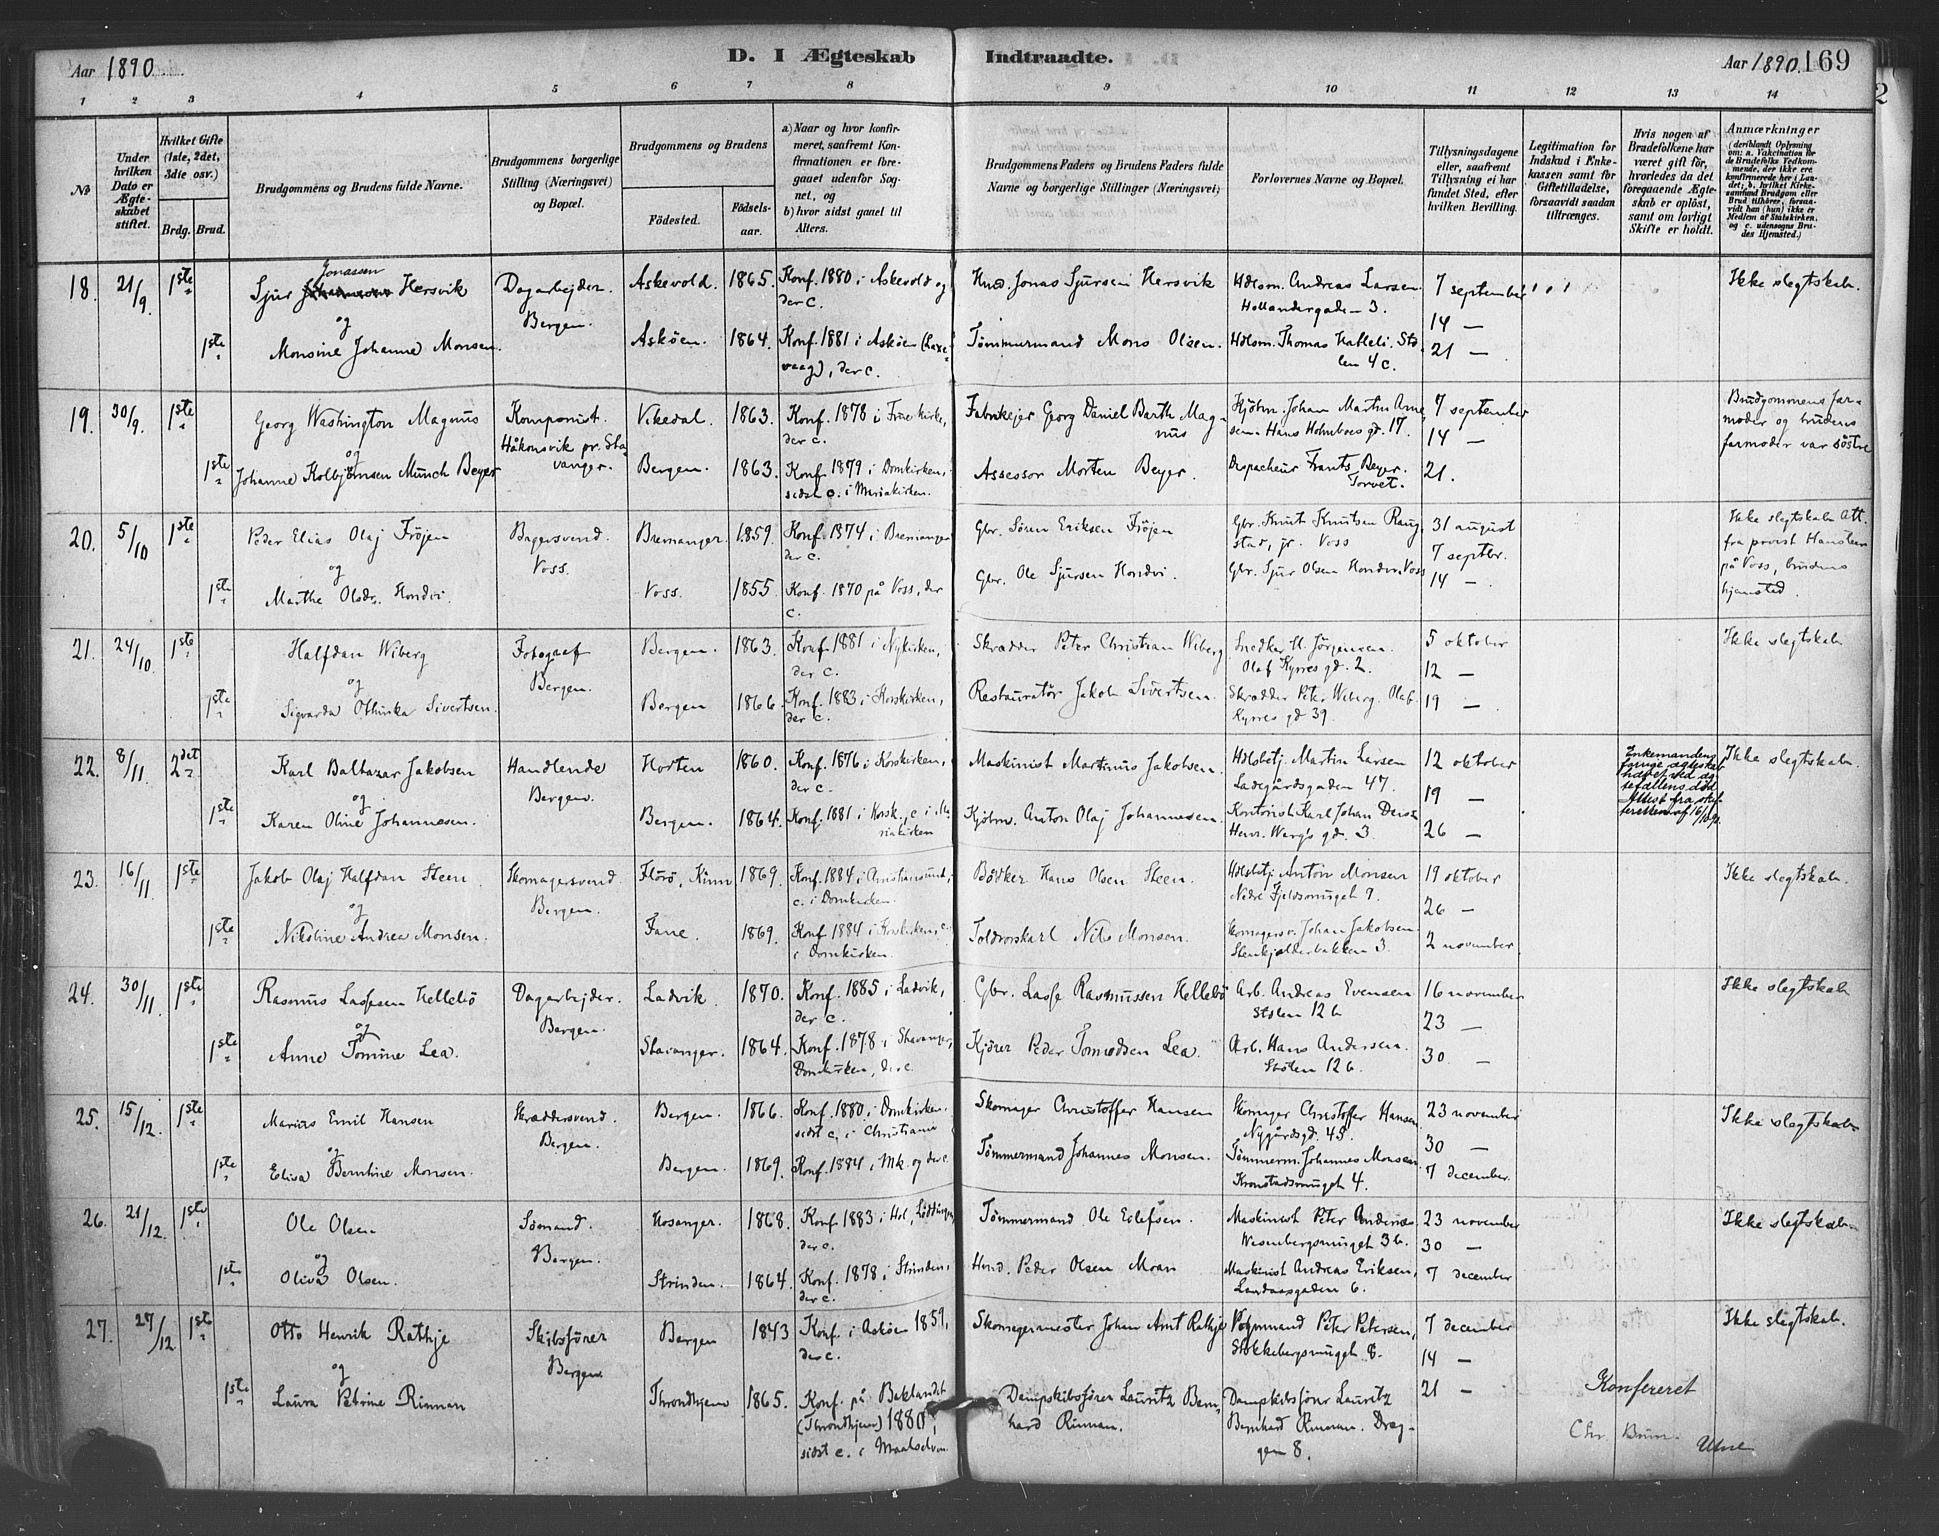 SAB, Mariakirken Sokneprestembete, H/Haa/L0007: Ministerialbok nr. A 7, 1878-1893, s. 169